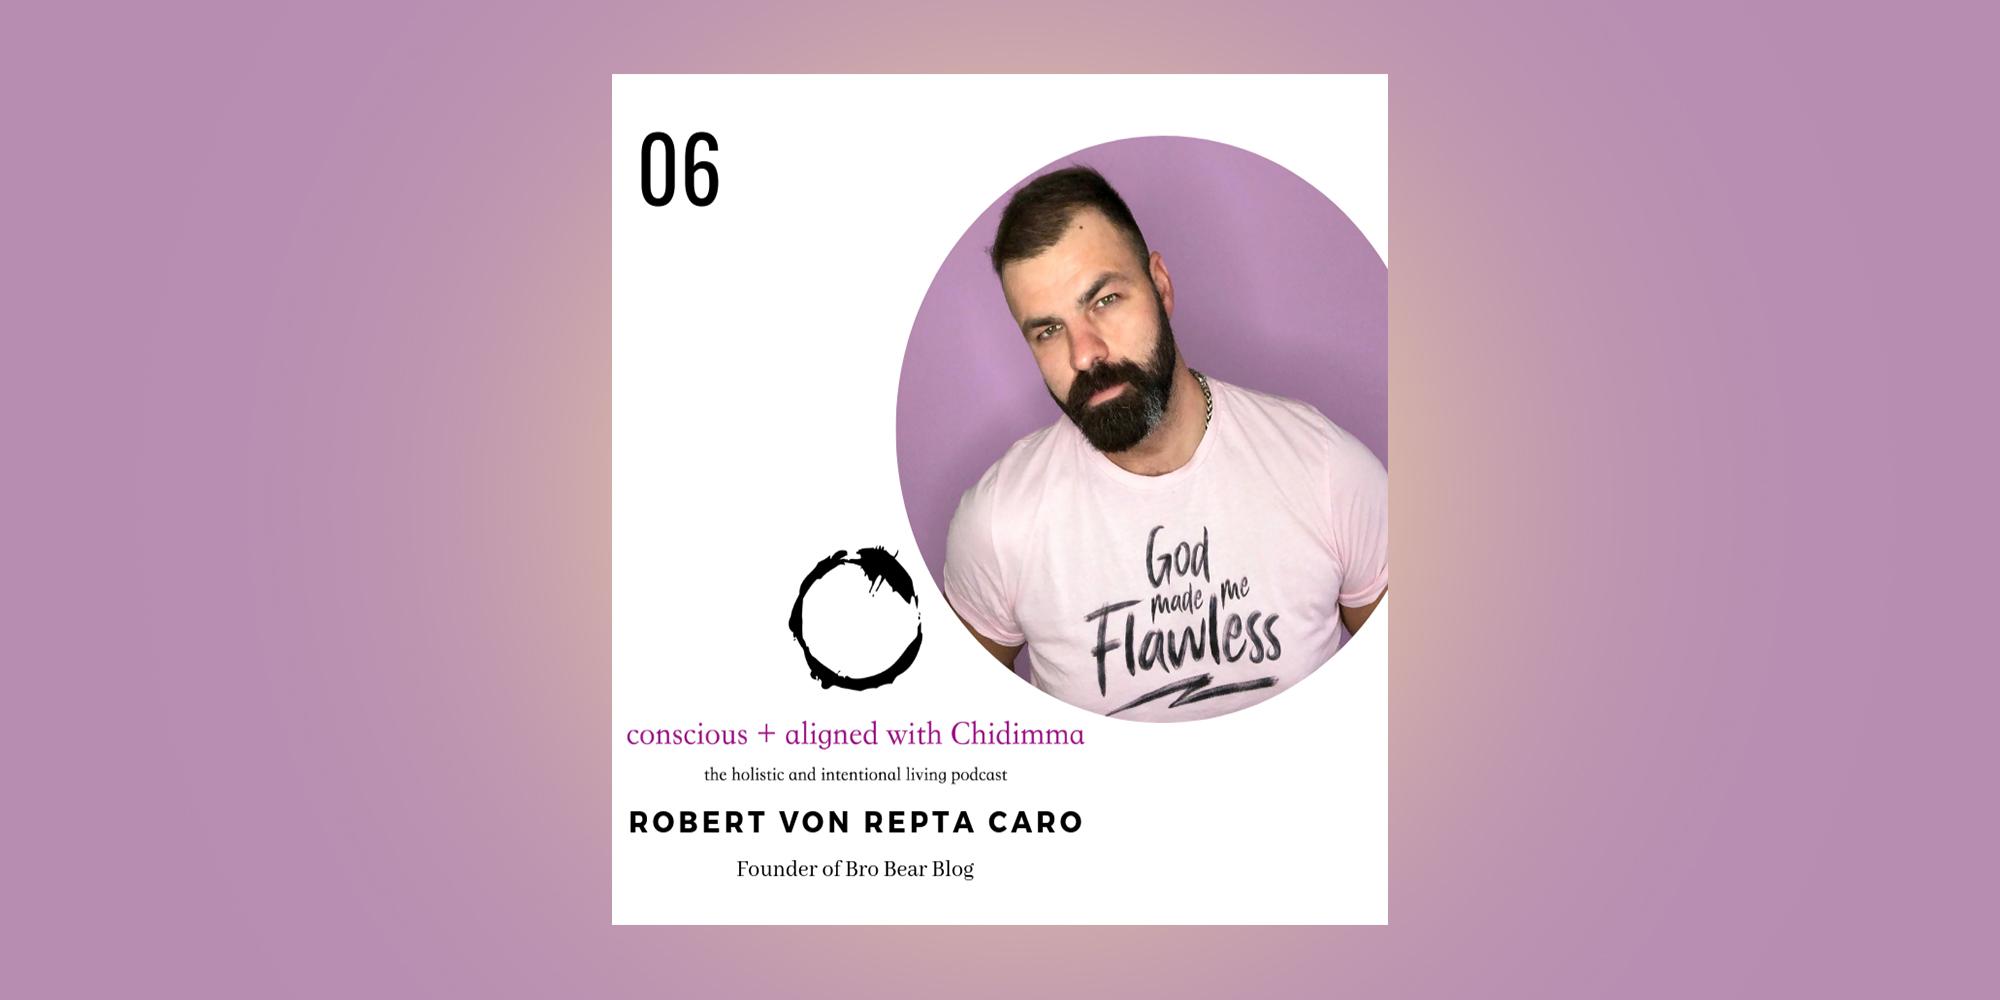 consious-and-aligned-podcast-robert-von-repta-caro-interview-bro-bear-blog.jpg